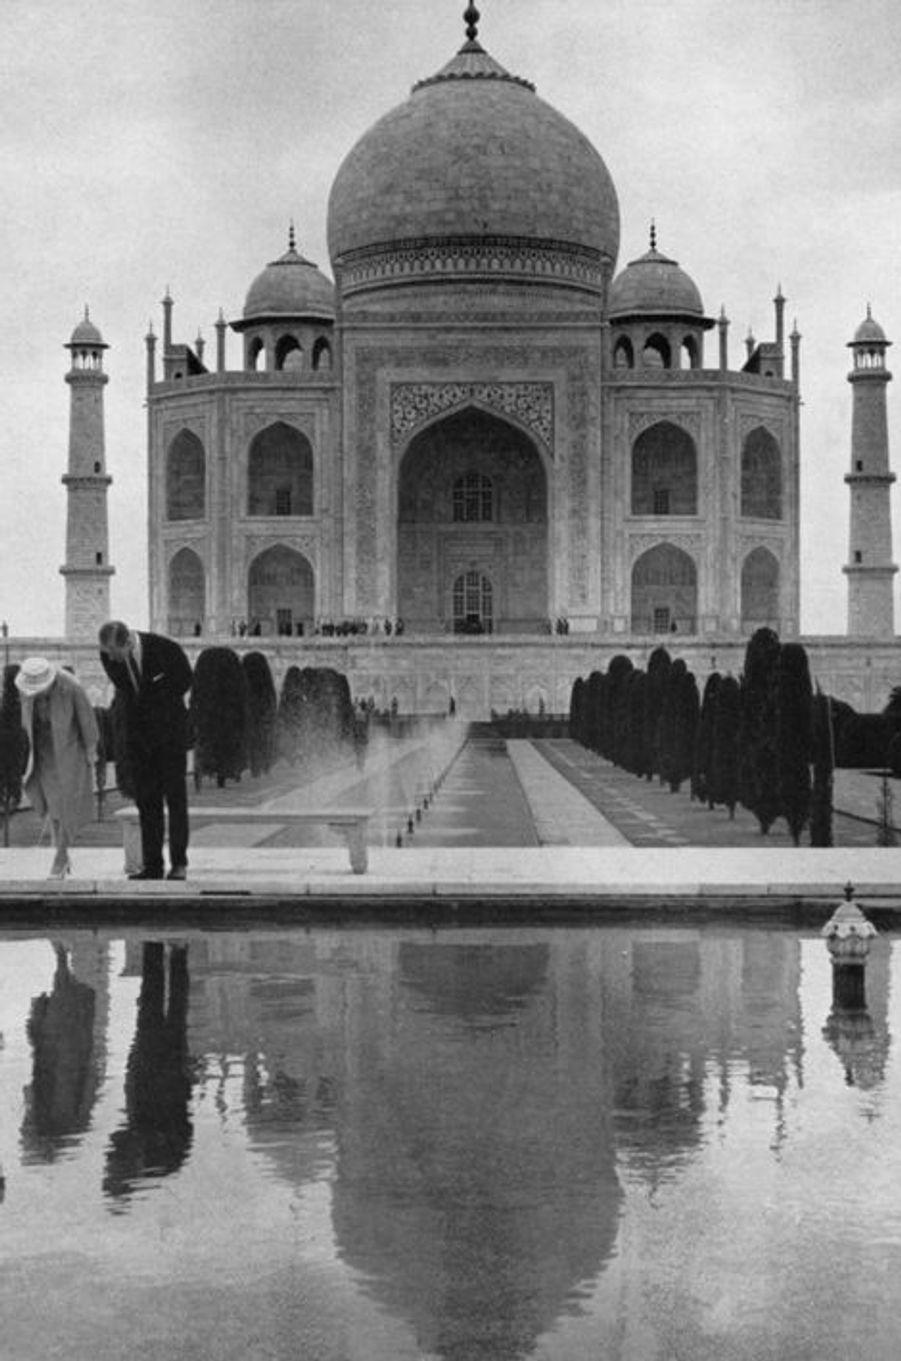 La reine Elizabeth II avec le prince Philip au Taj Mahal à Agra, en 1961